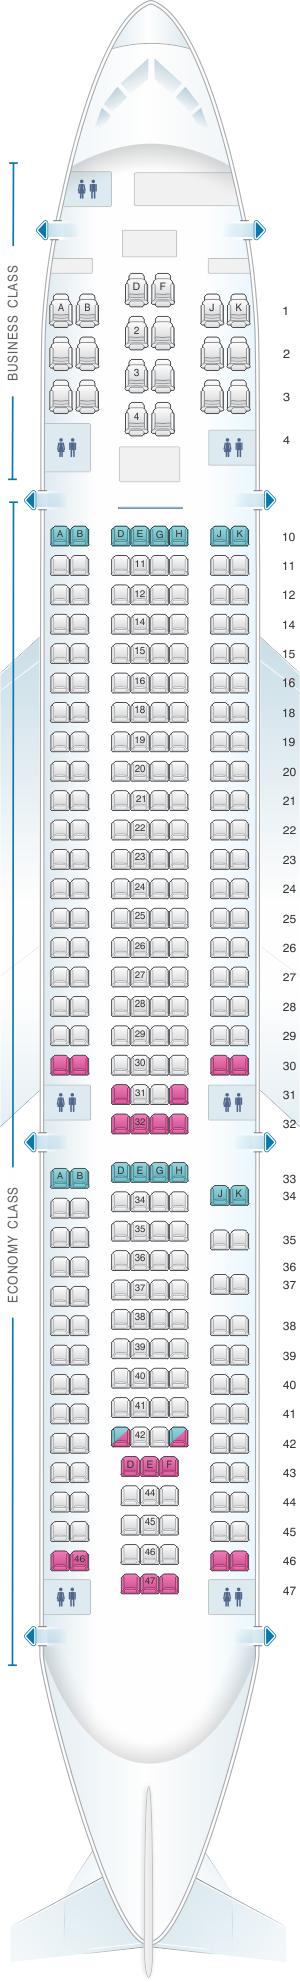 Seat Map Alitalia Airlines Air One Airbus A330 200 283pax Seatmaestro